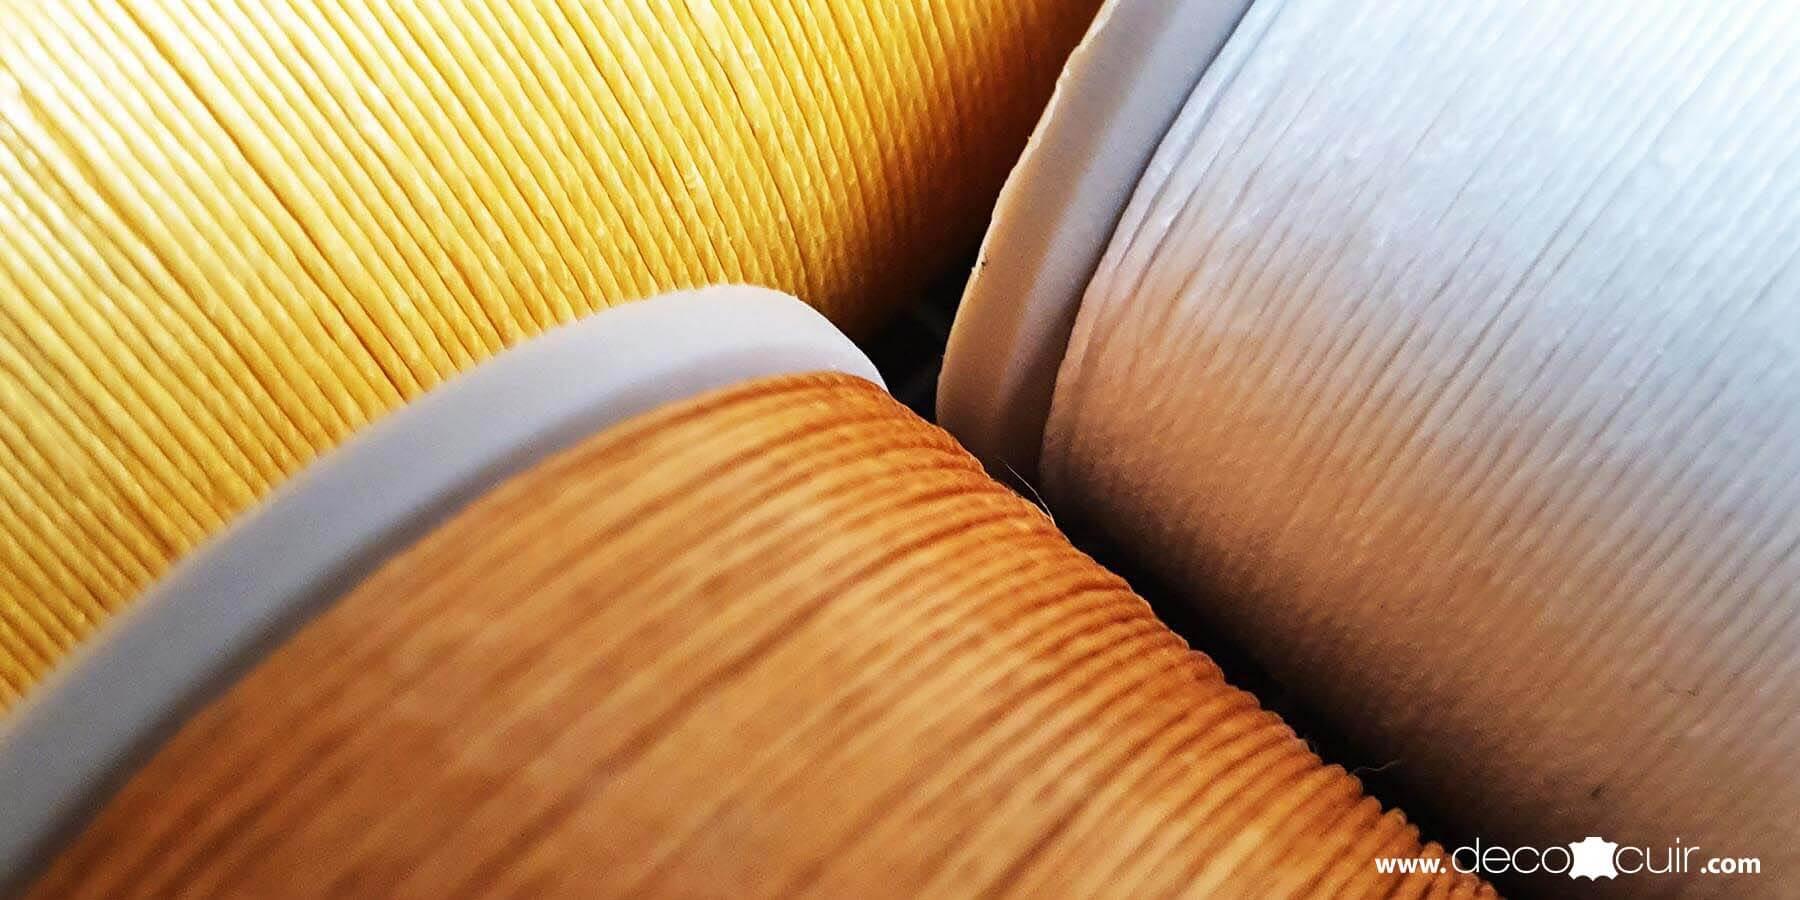 bobine de fil couture cuir